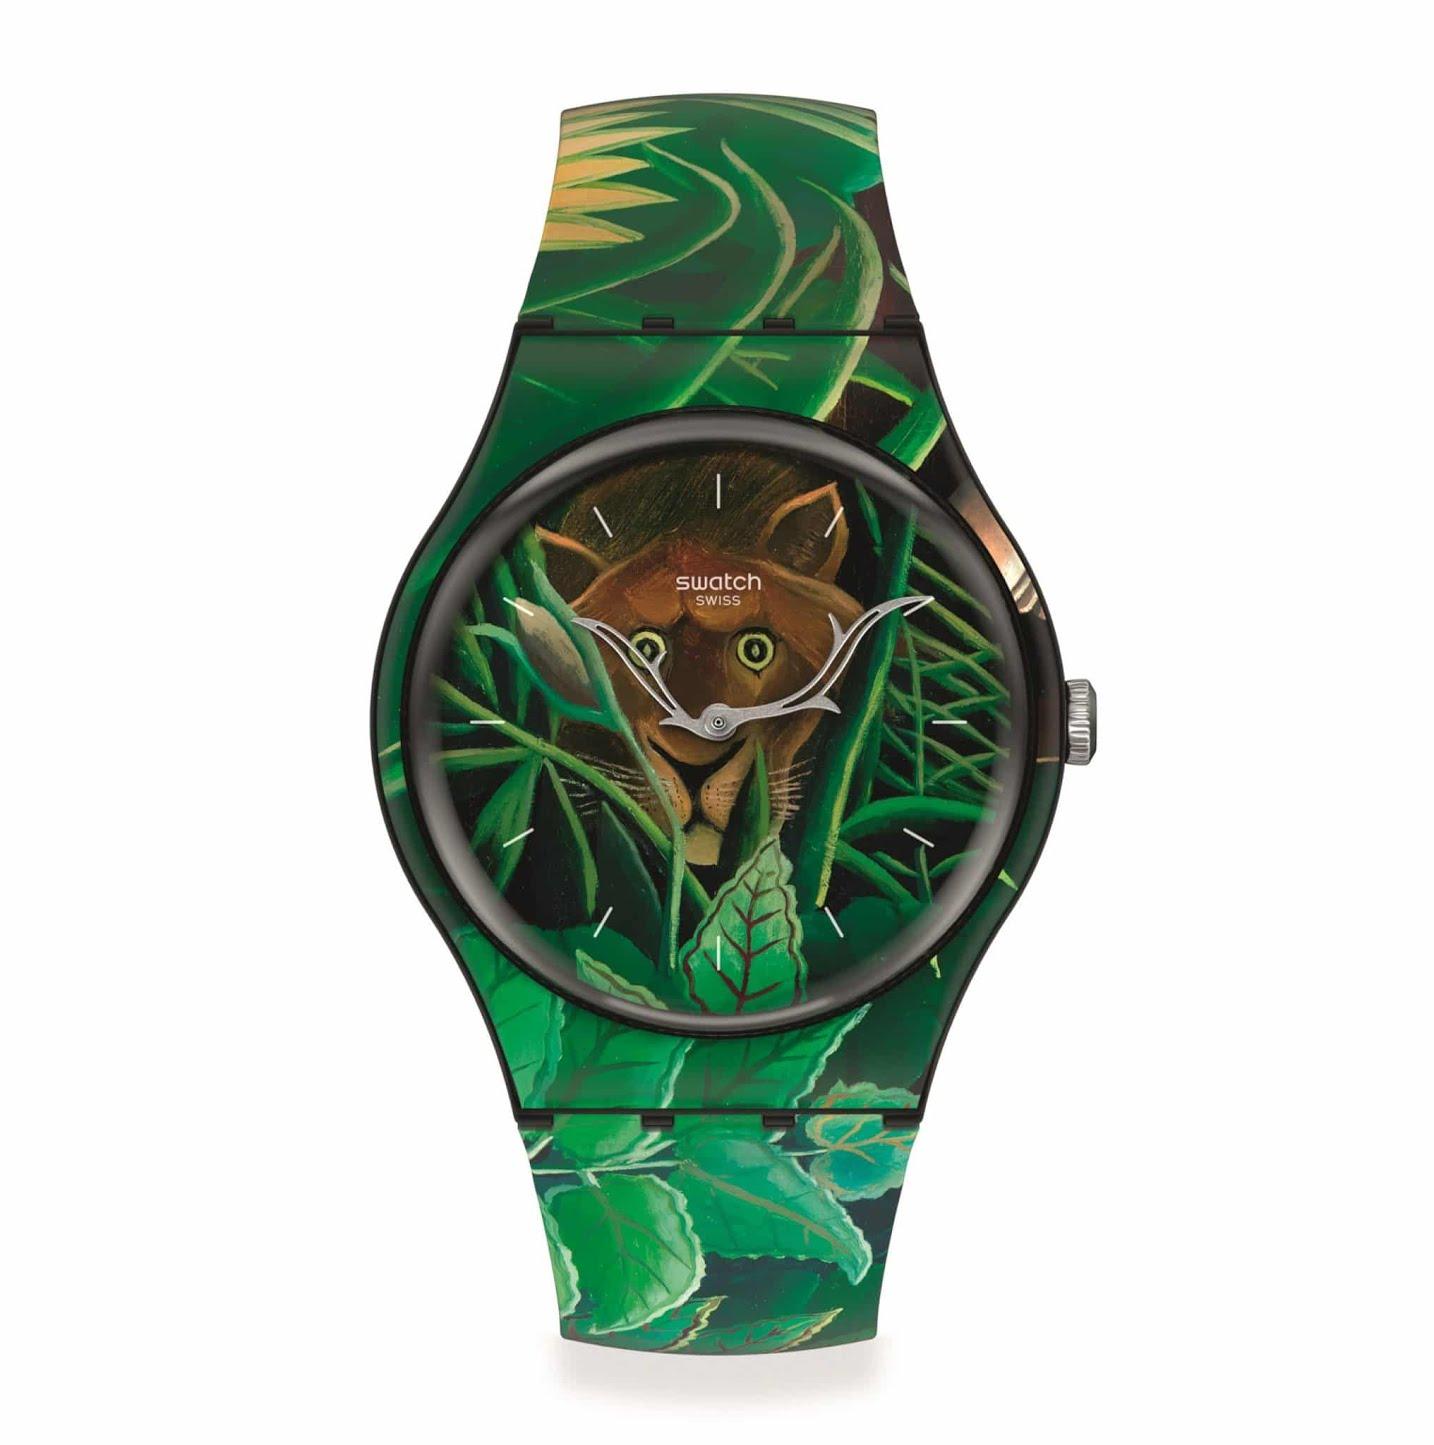 Swatch x MoMA - Douanier Rousseau